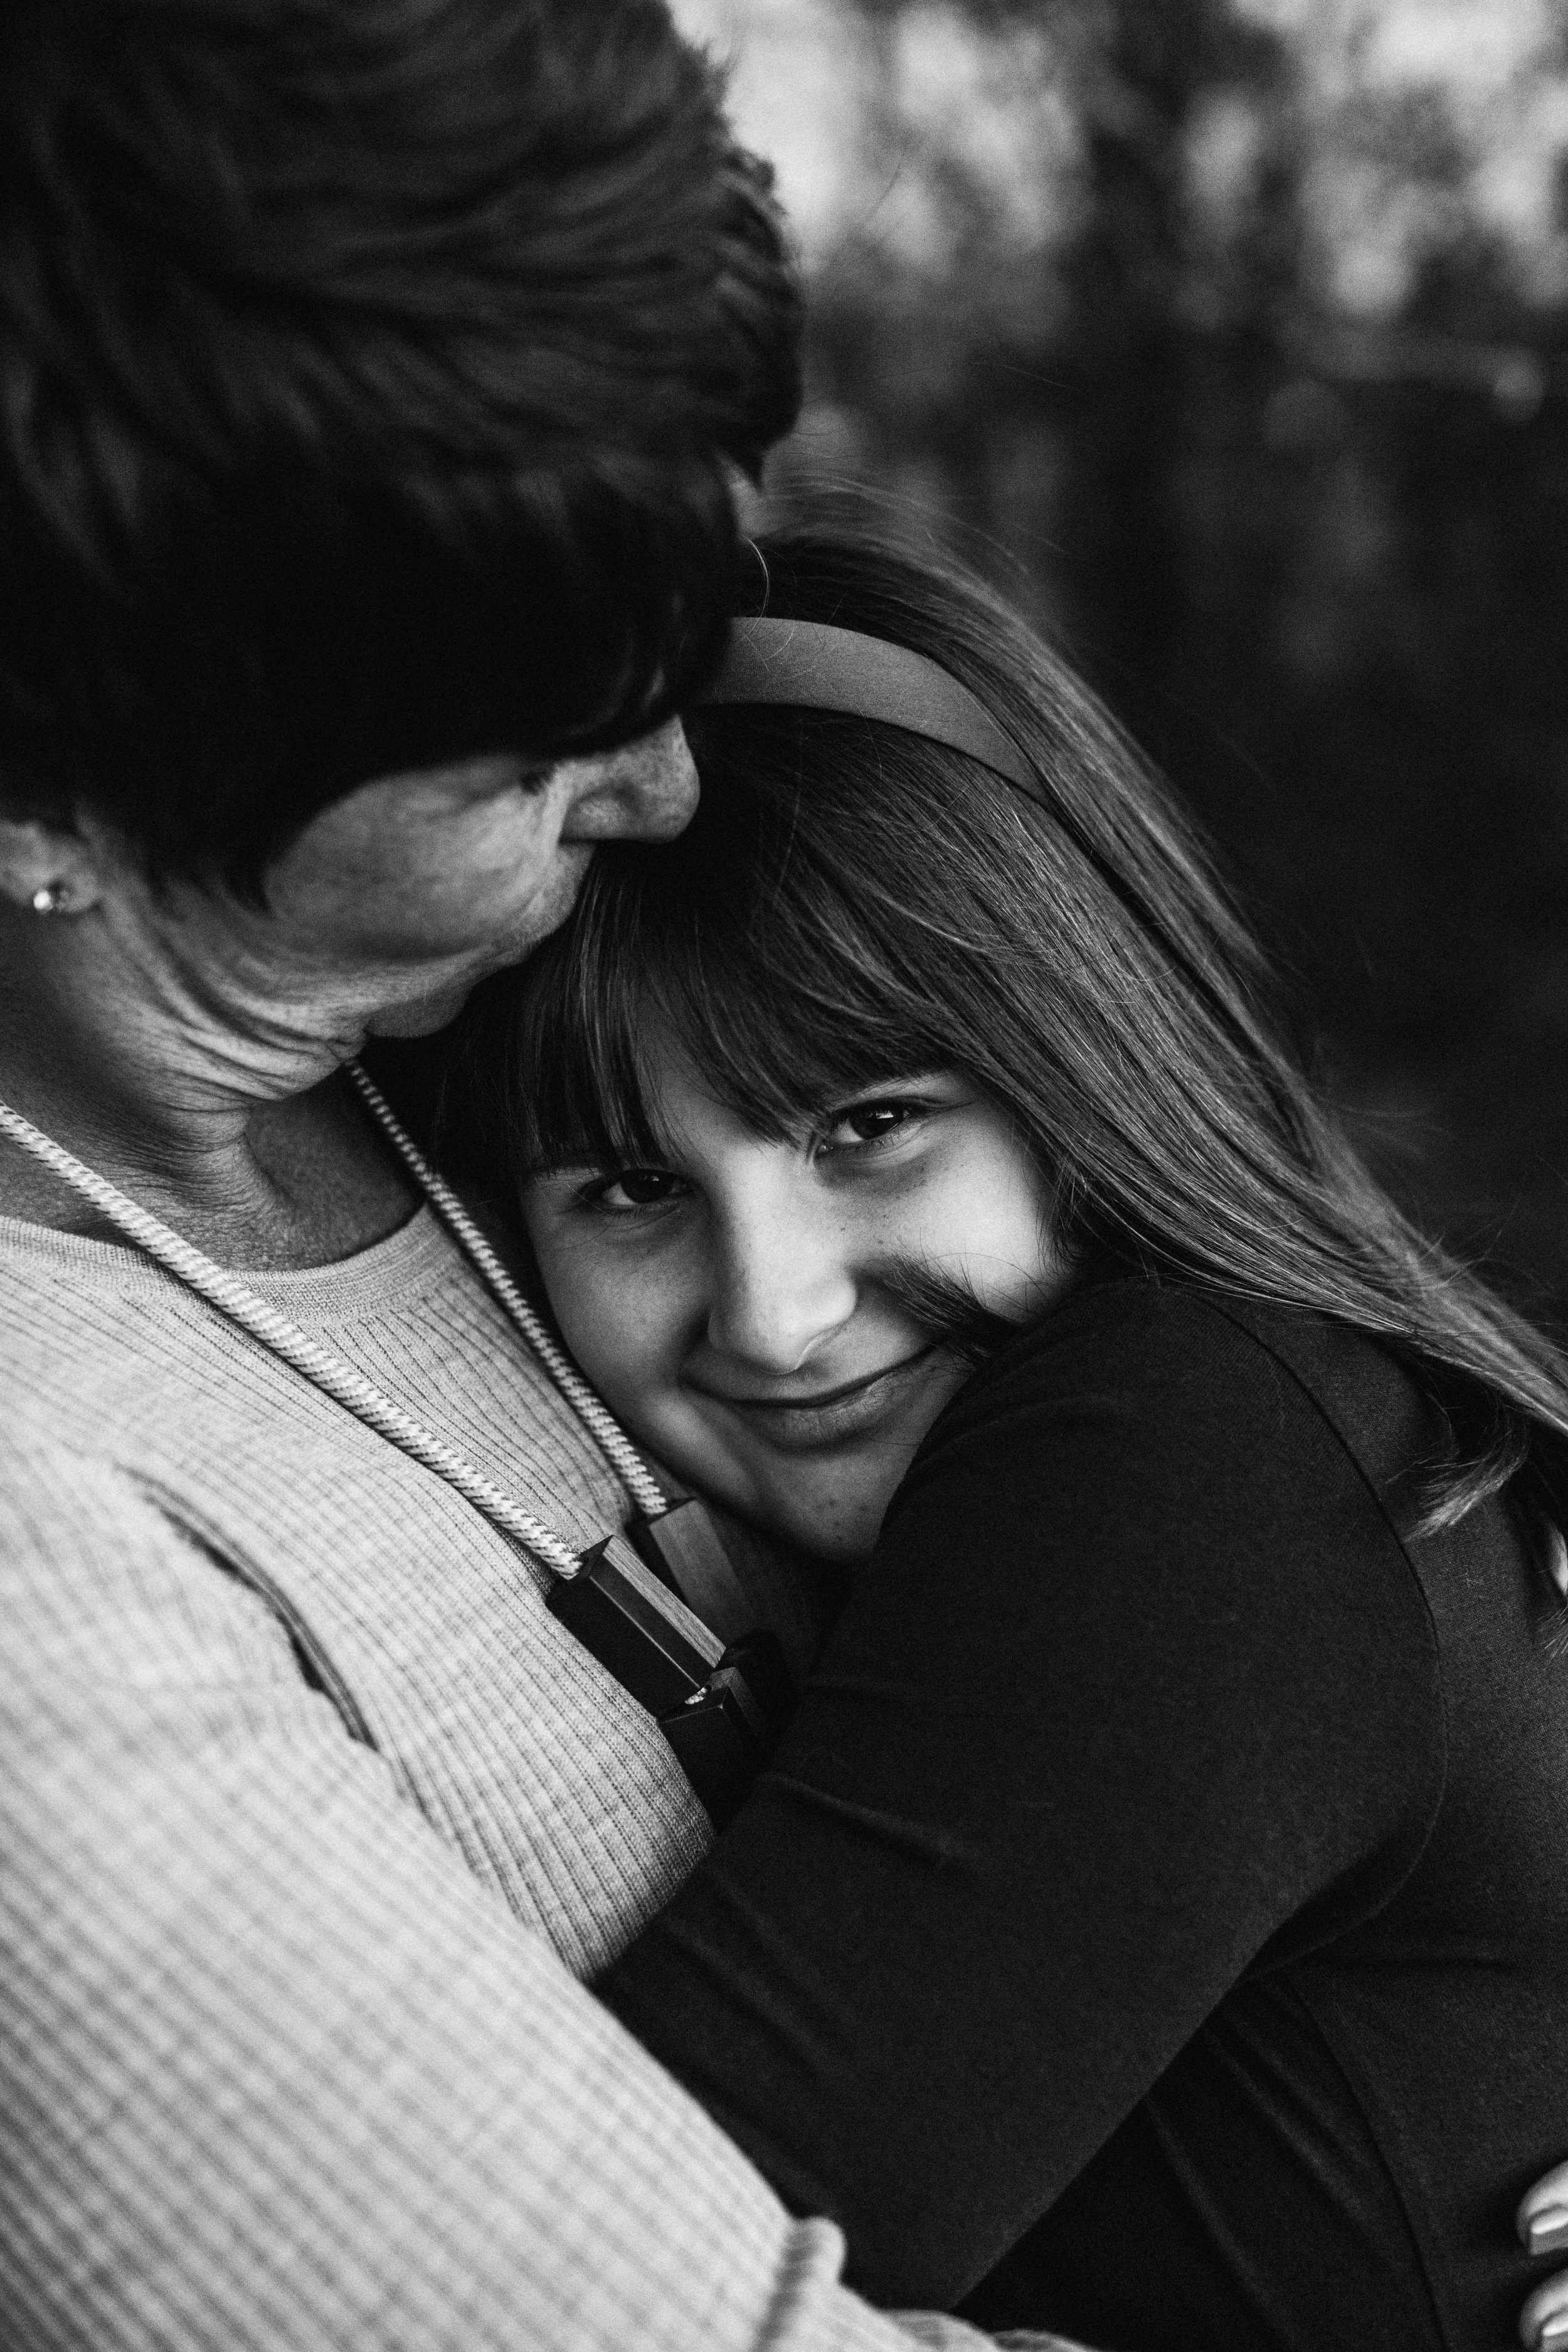 camden-macarthur-family-photography-www.emilyobrienphotography.net-42.jpg